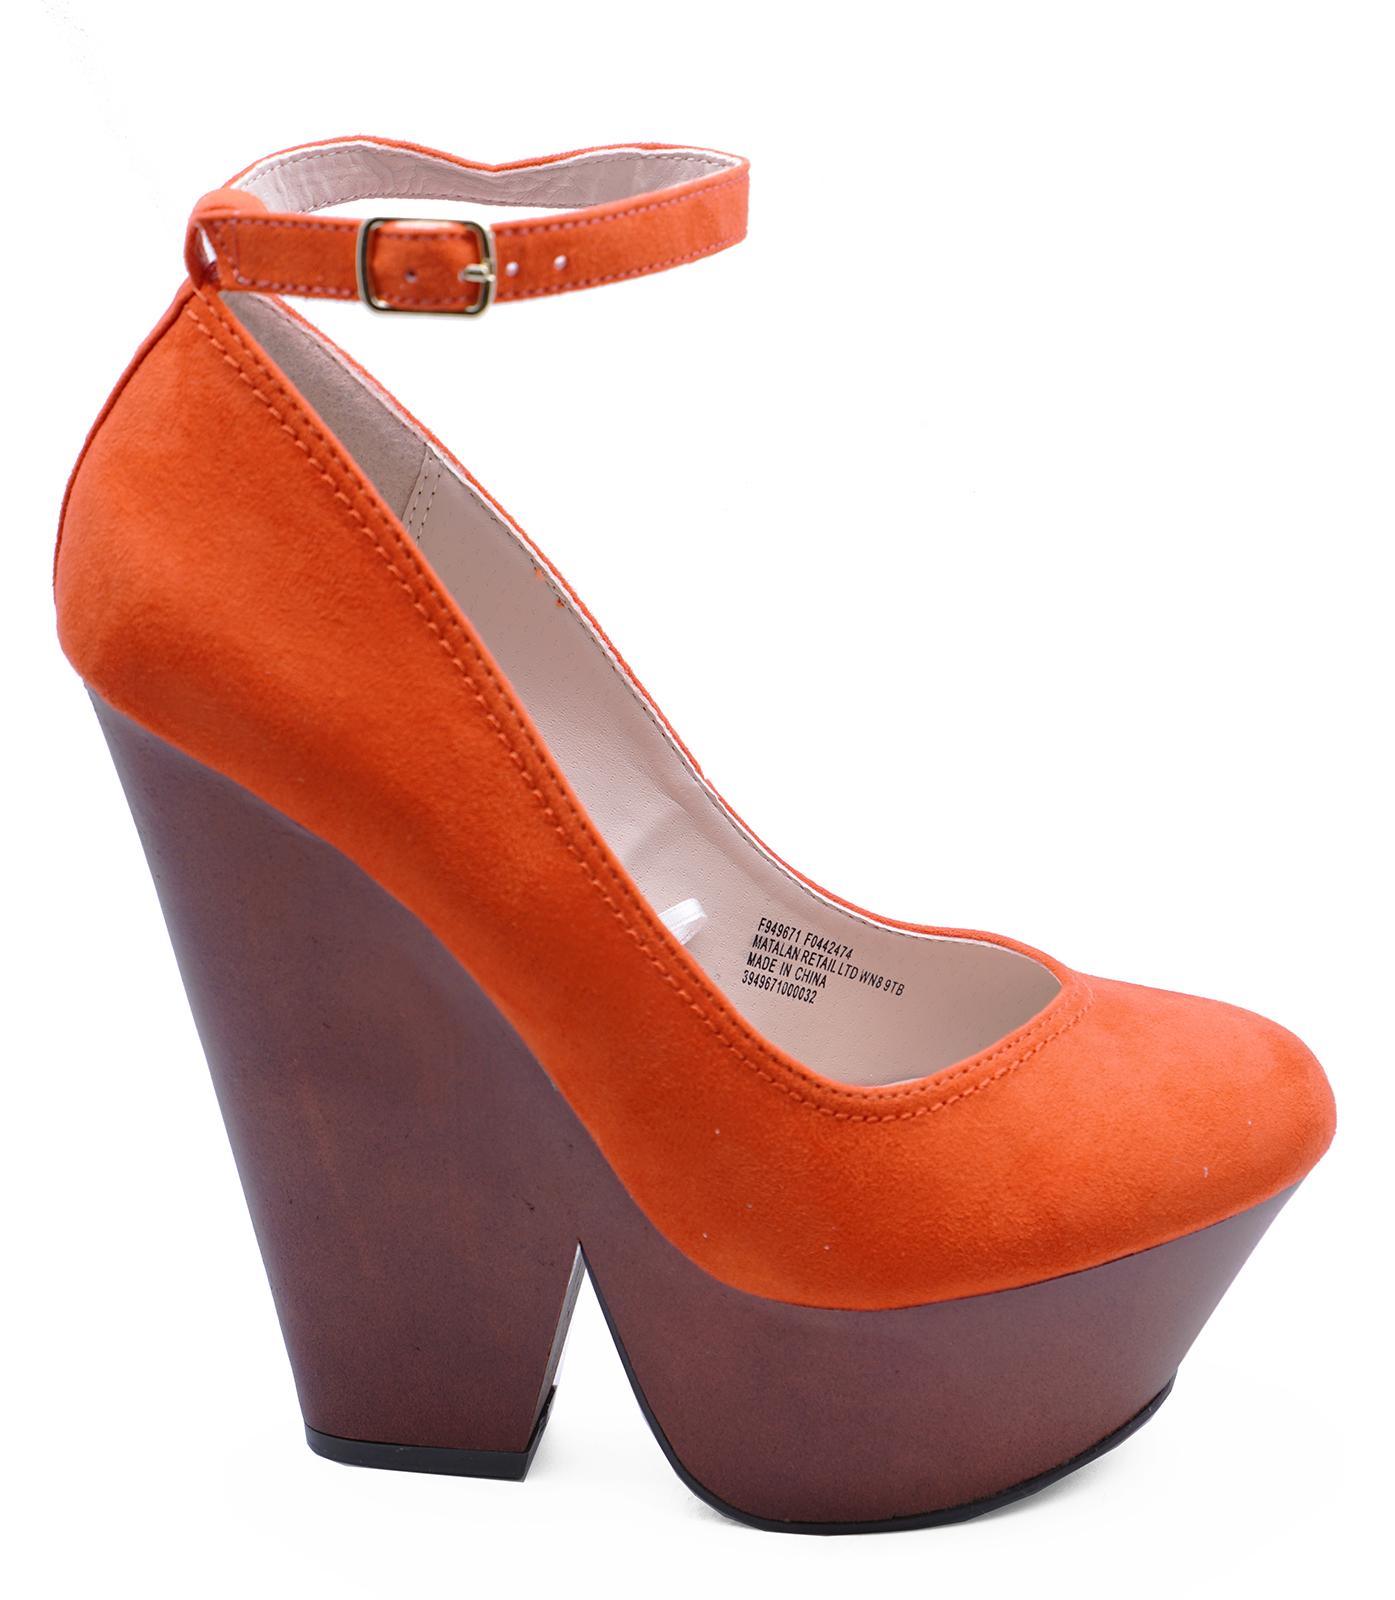 eb59287b532 Details about WOMENS ORANGE SLIP-ON PLATFORM HIGH-HEEL WEDGES ANKLE STRAP  SHOES SIZES 3-8